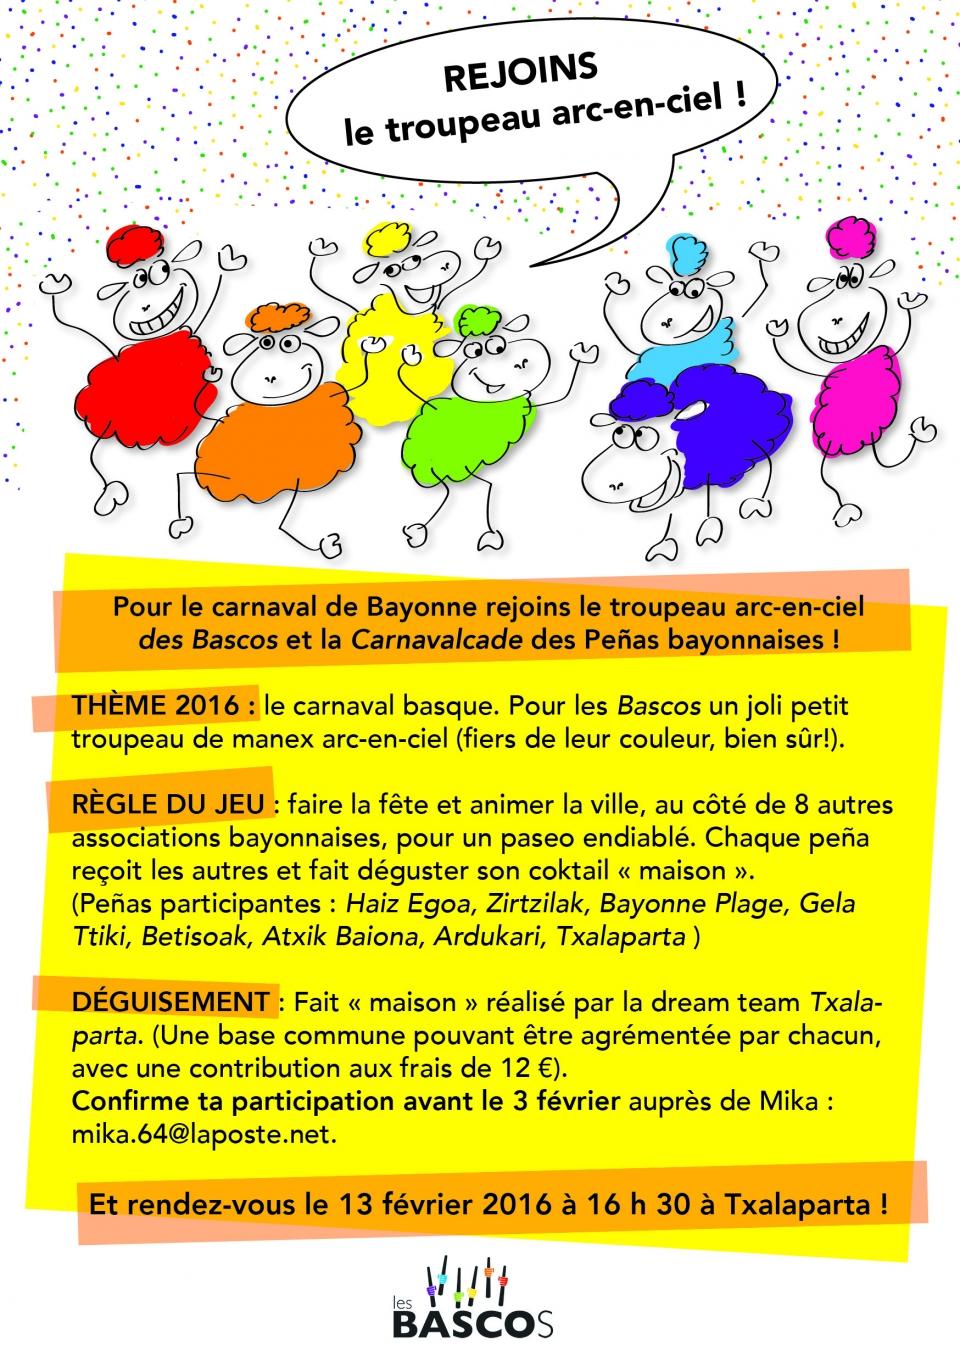 Carnaval2016.jpg